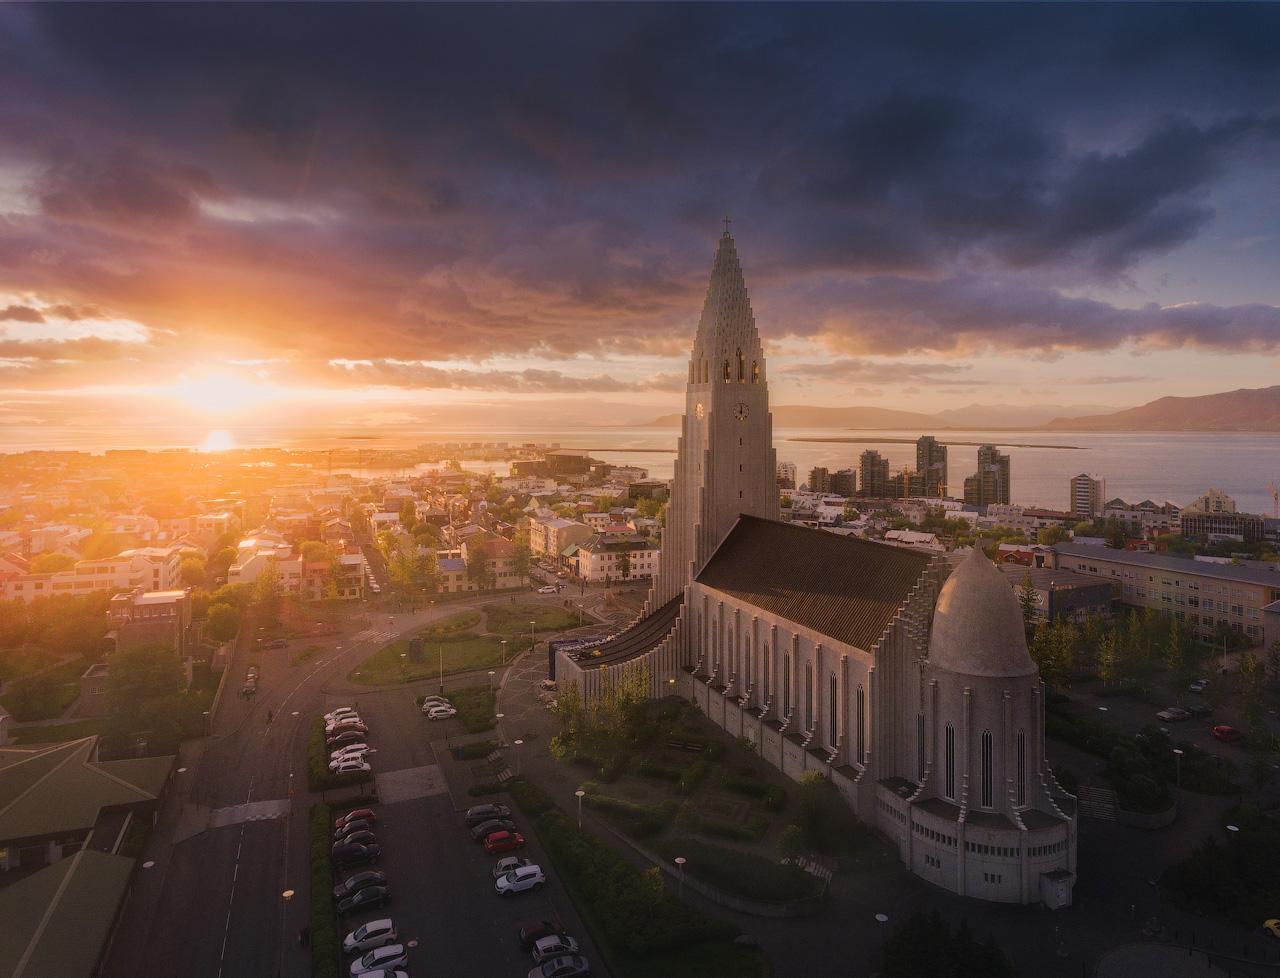 Hallgrímskirkja church awash in the glow of the Midnight Sun of the Icelandic summertime.